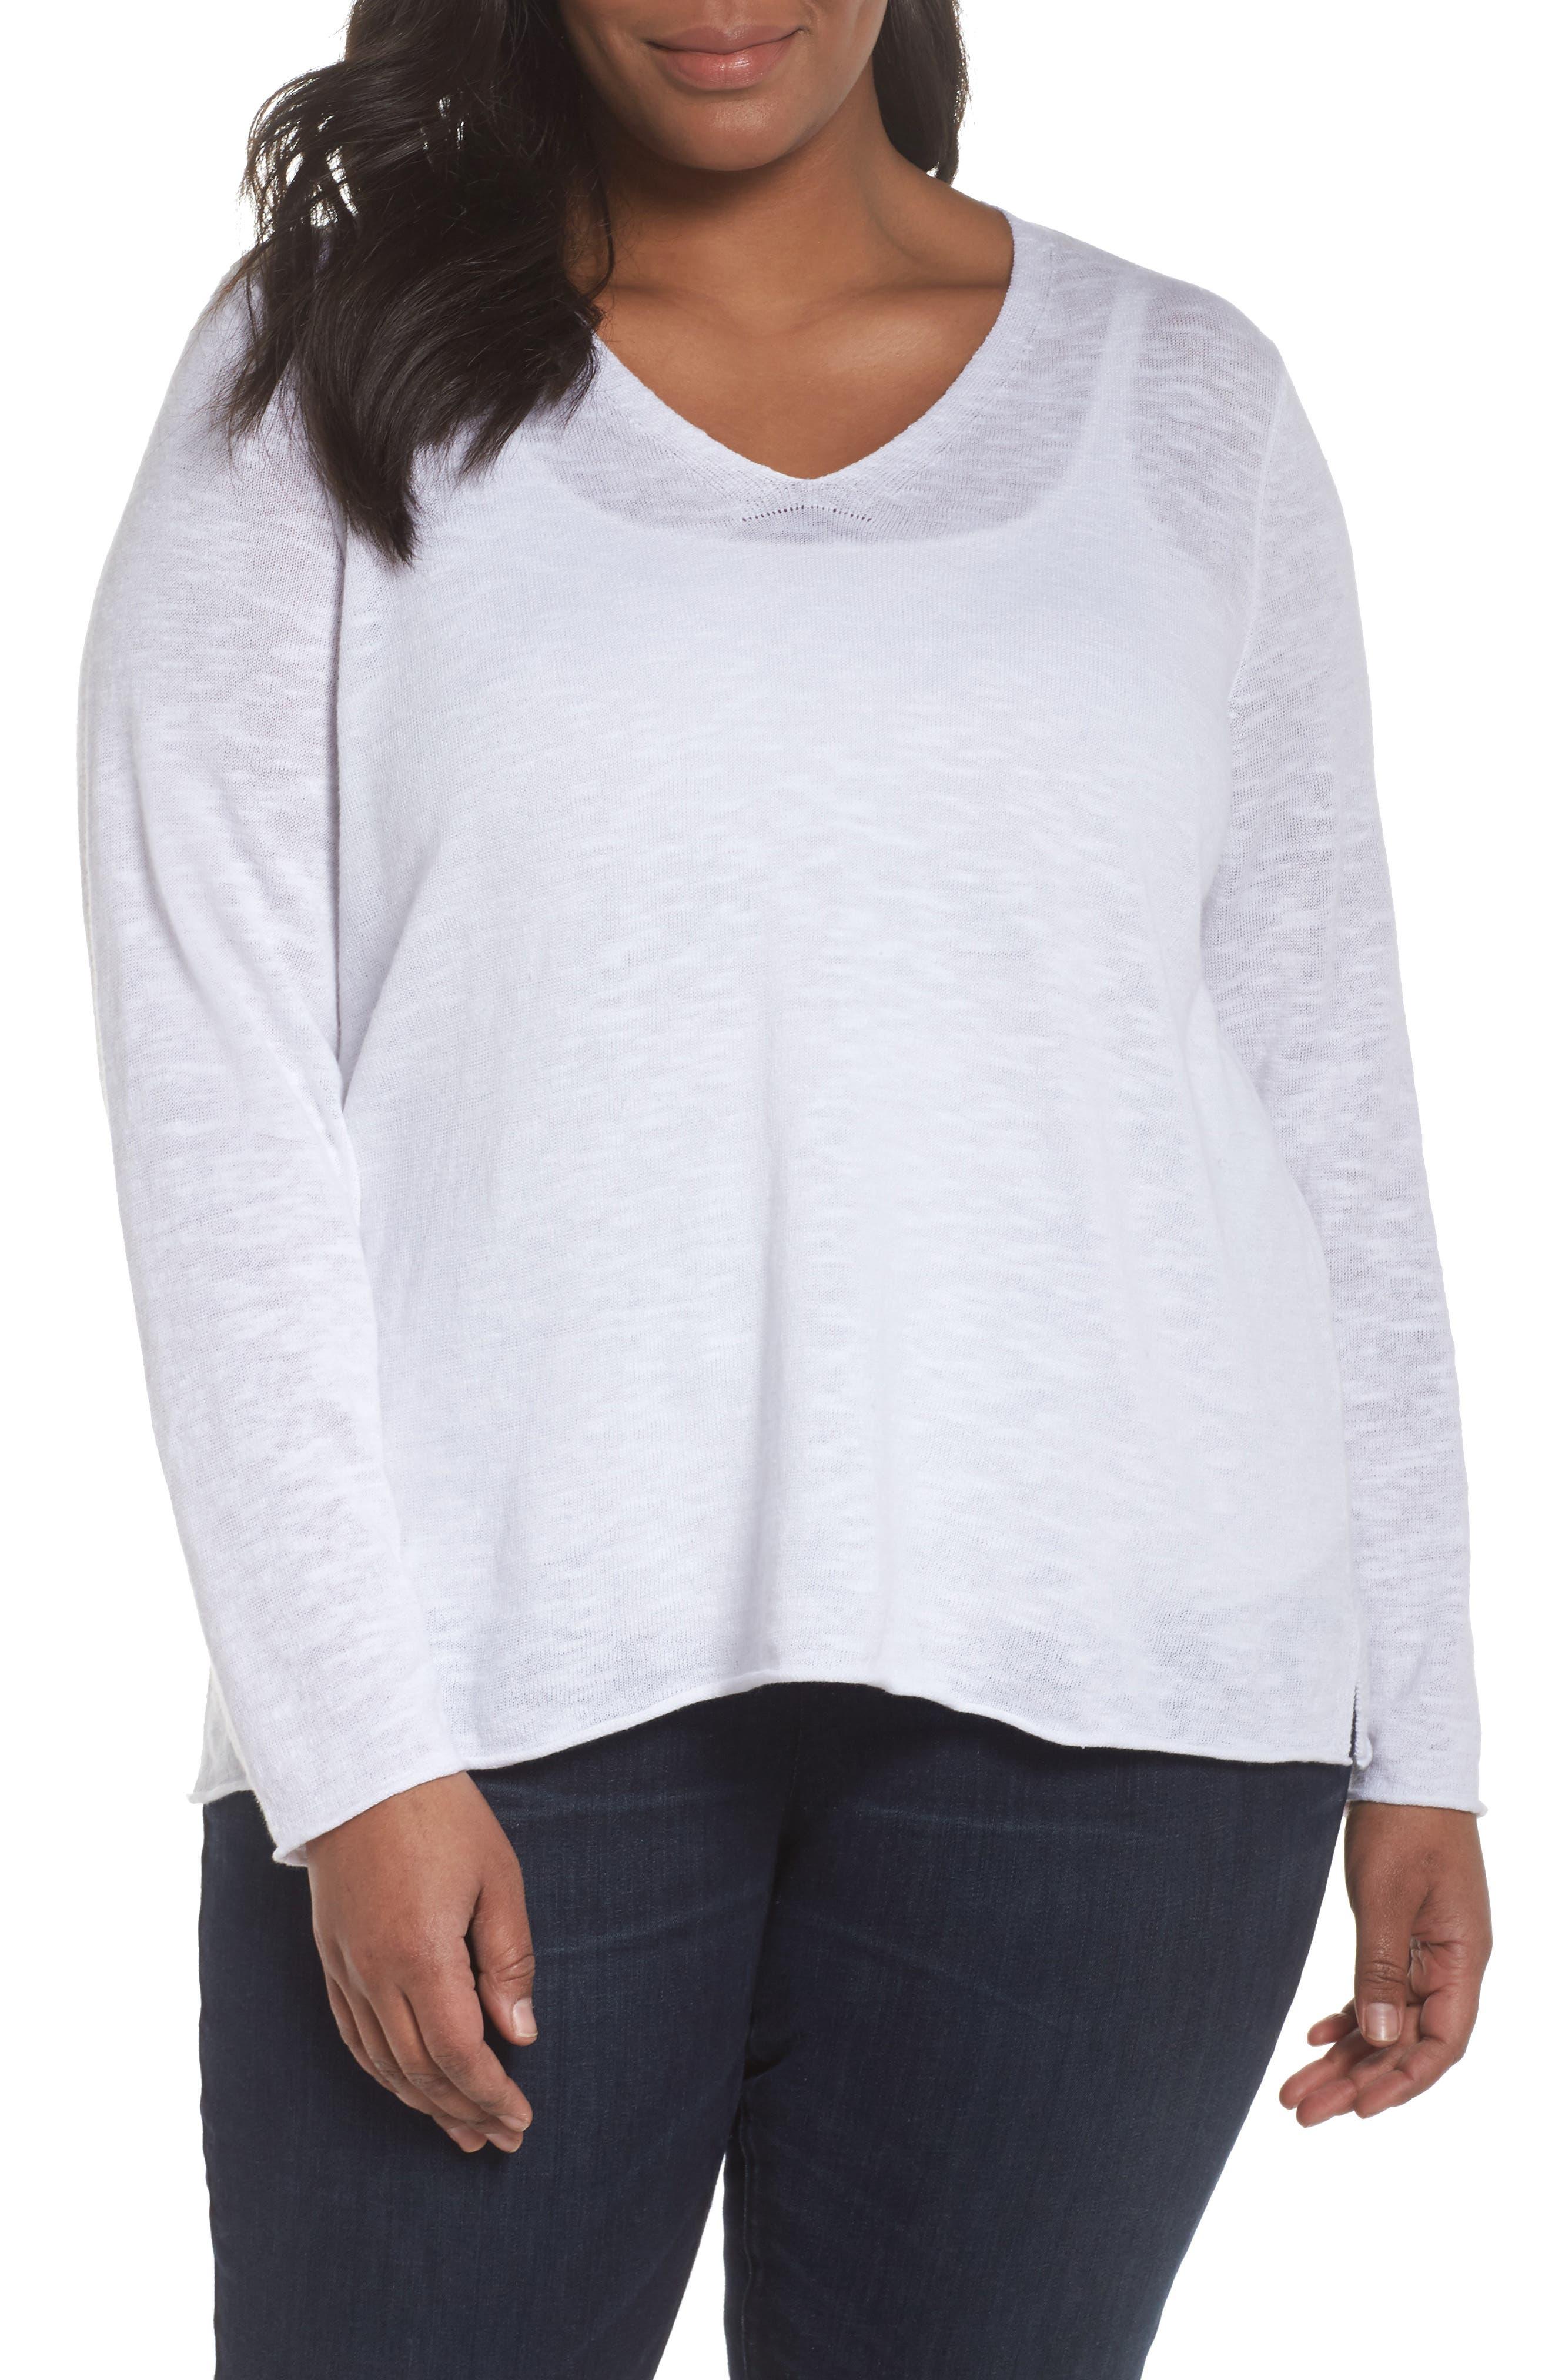 Boxy Organic Linen & Cotton Sweater,                         Main,                         color, 100